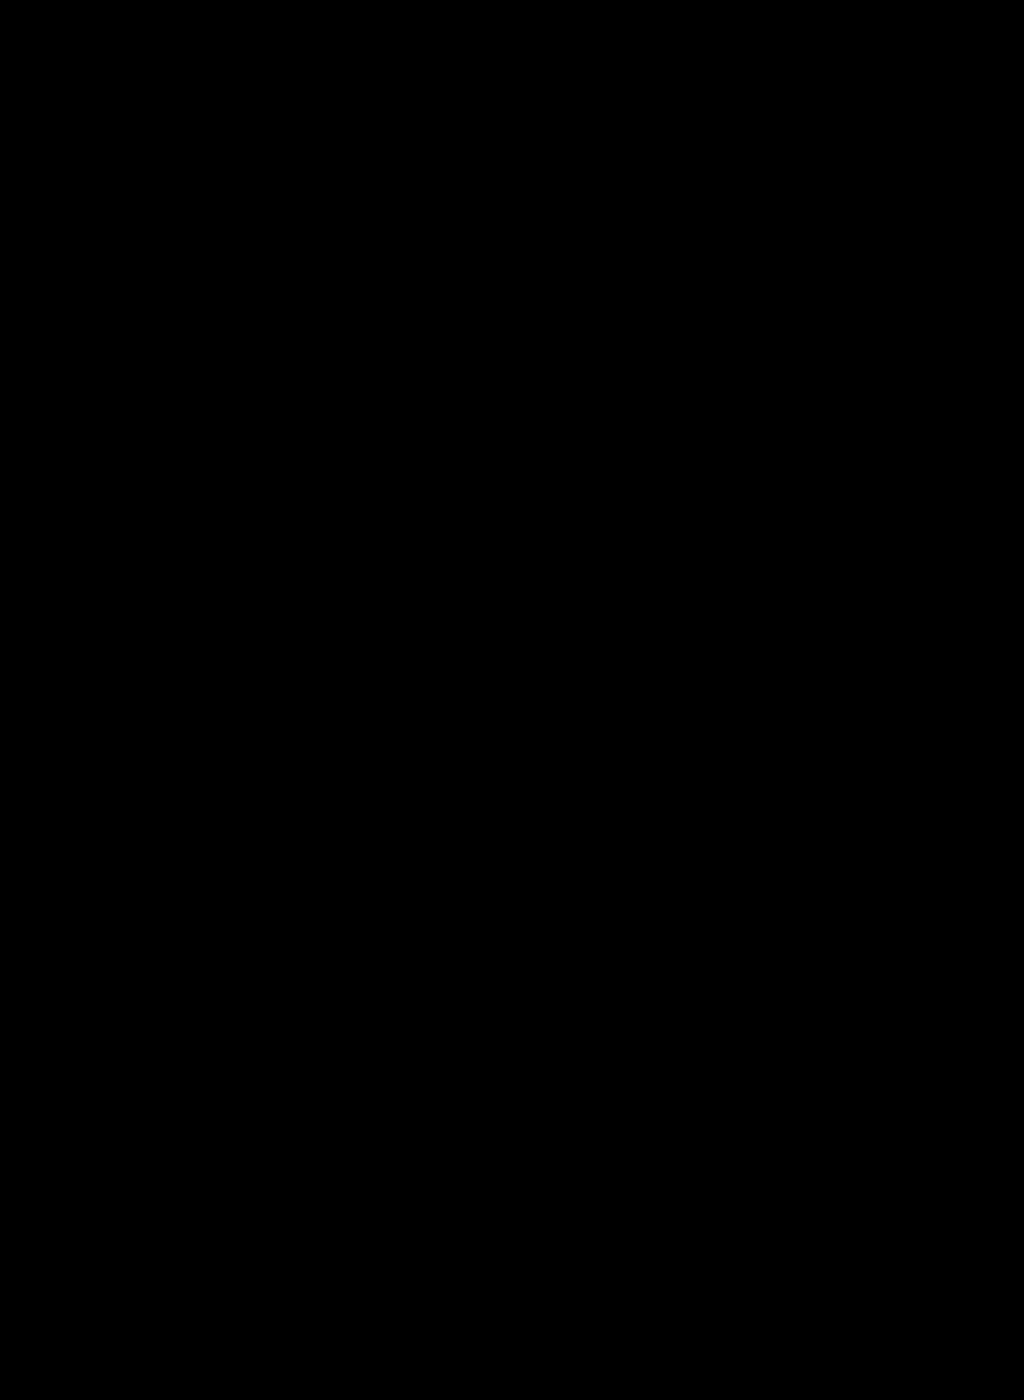 trans-800x600-1.png